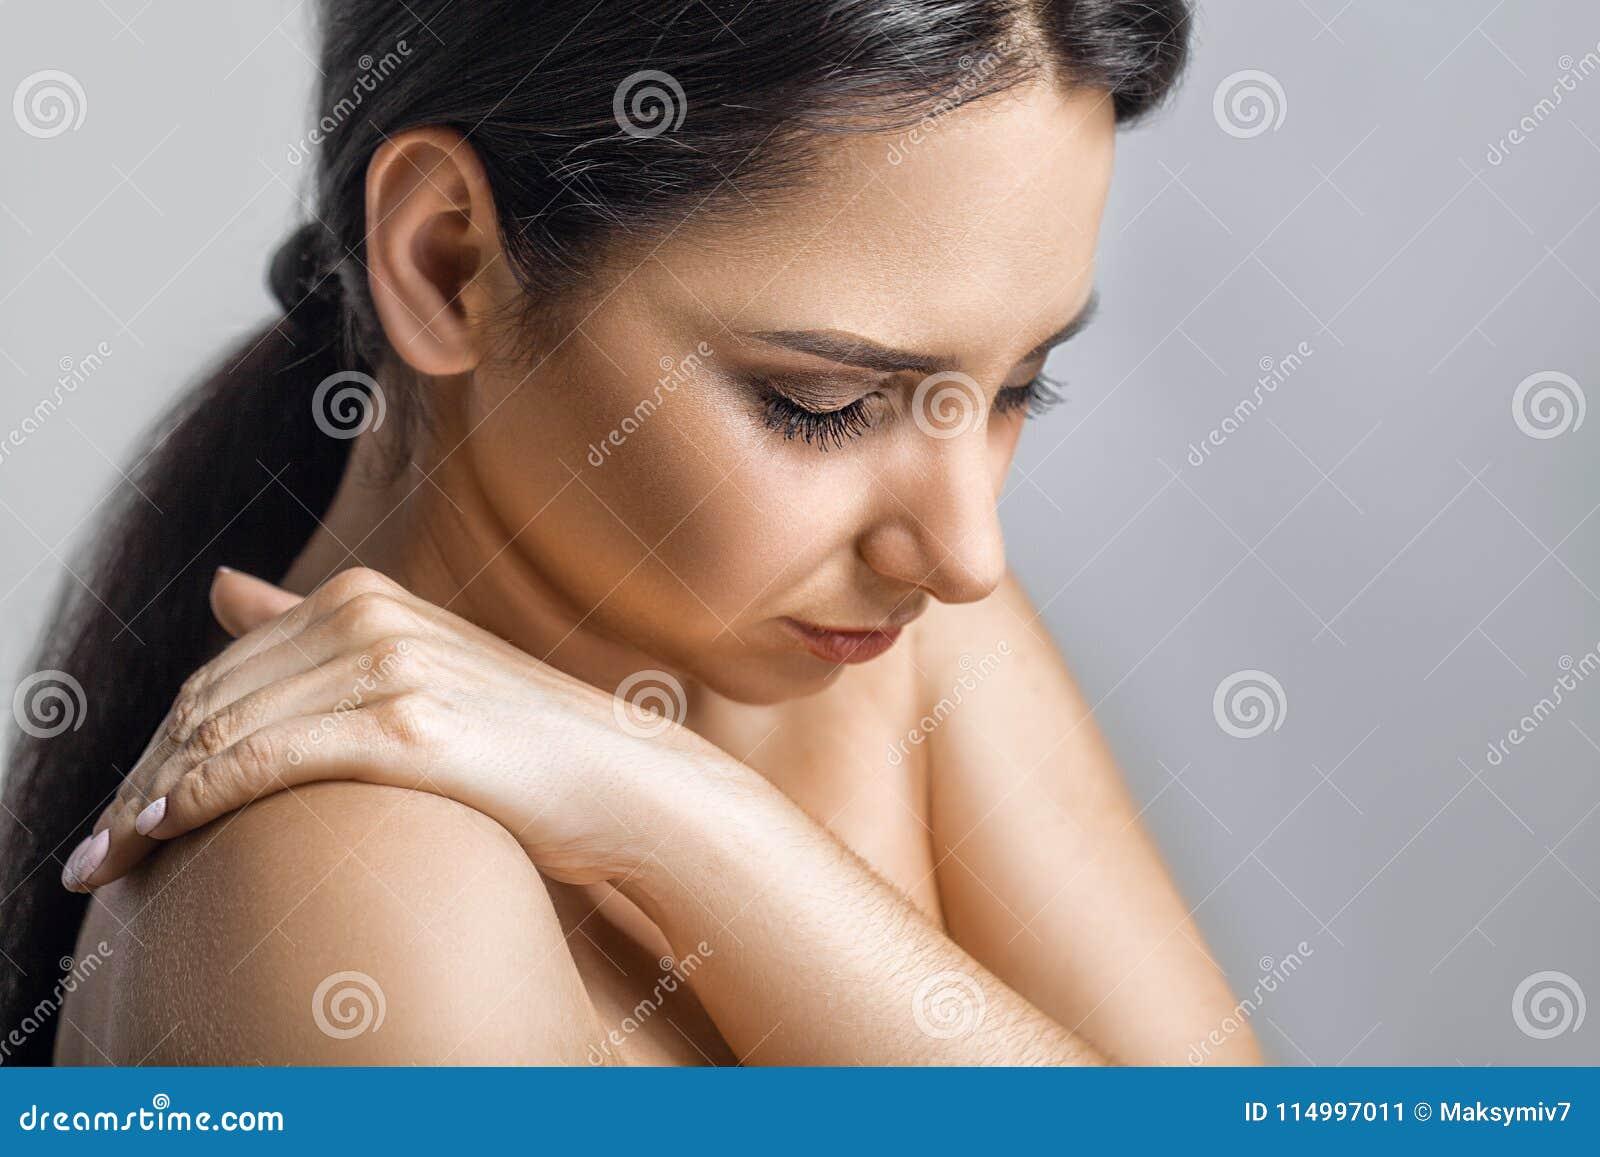 Feeling Up A Woman